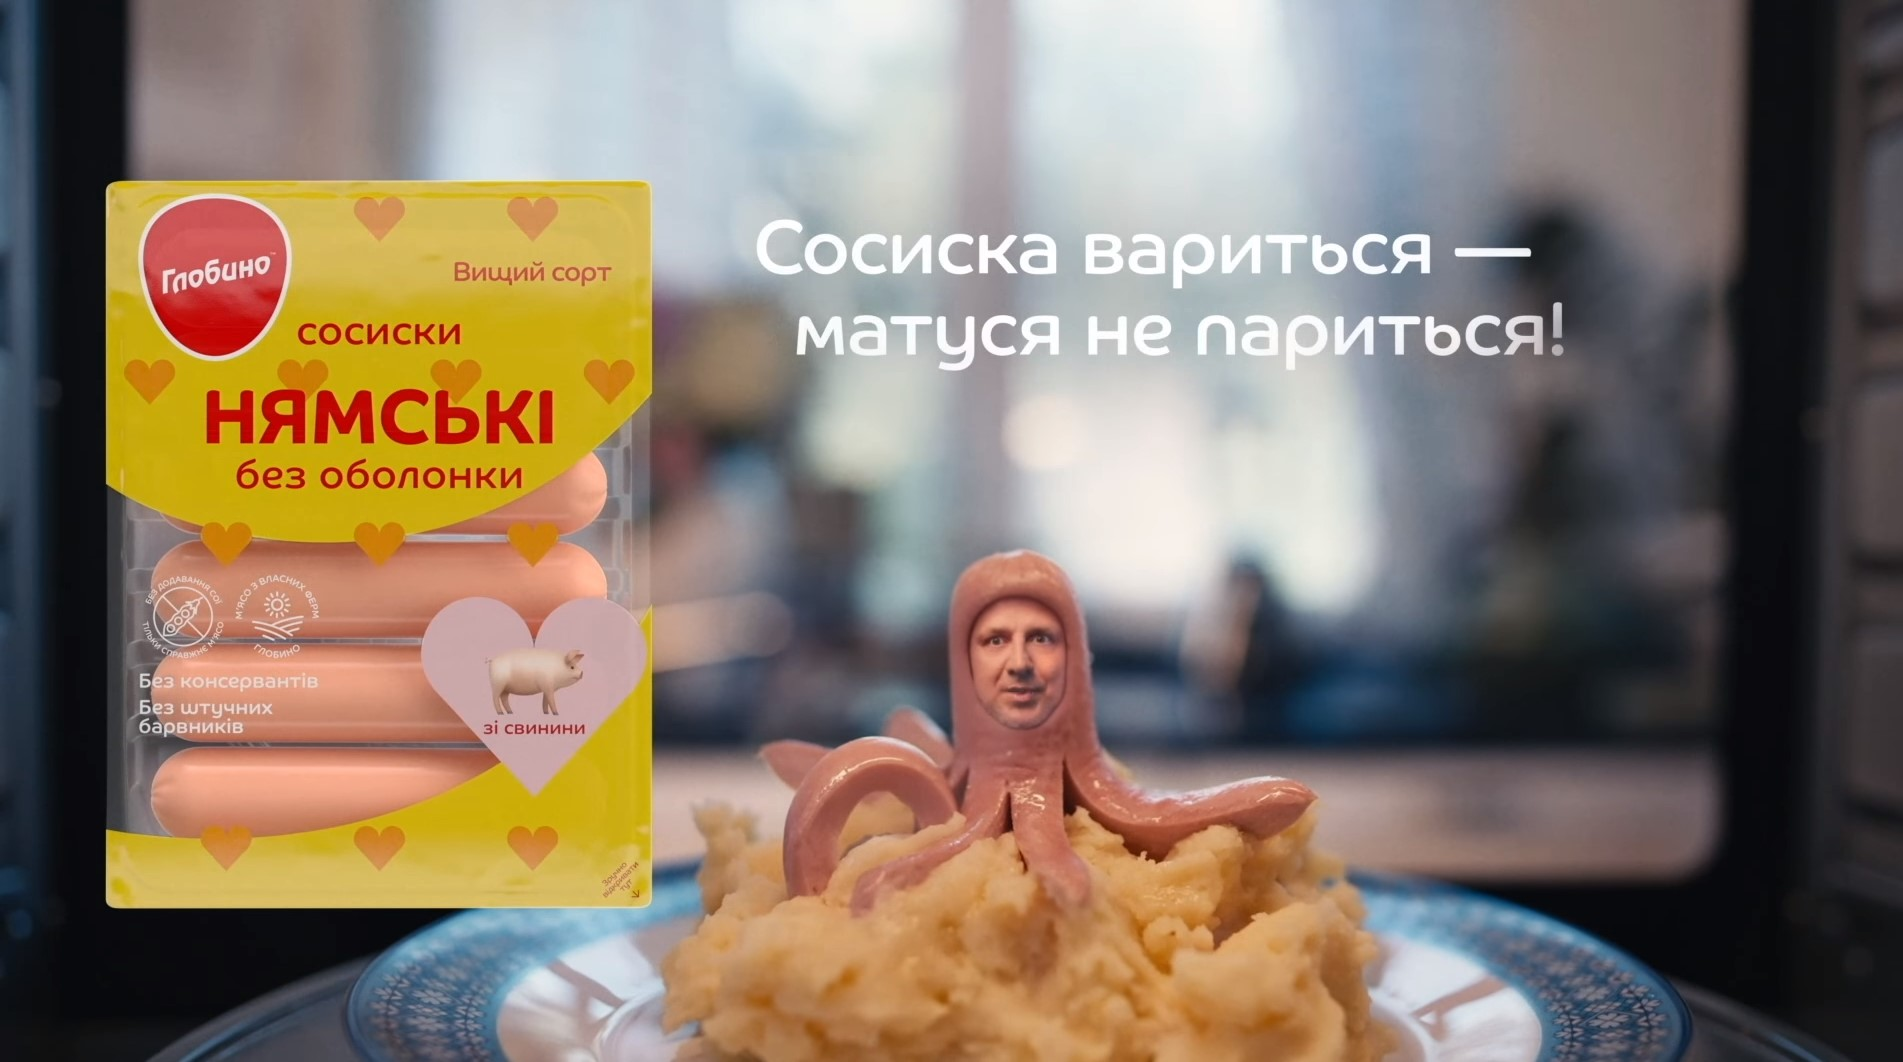 маркетинг сосиски потап реклама fedoriv